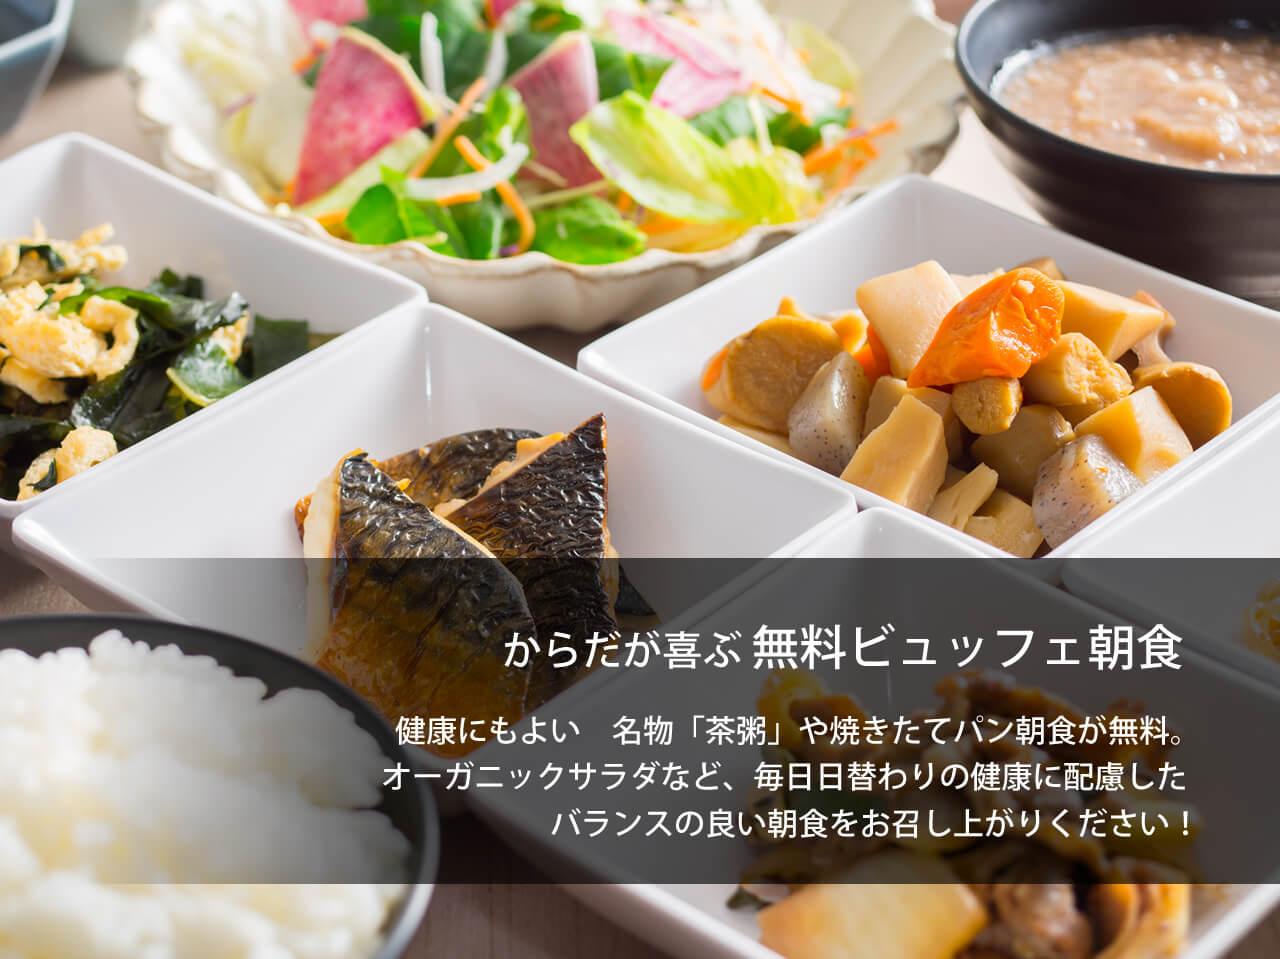 Super Hotel JR Nara Station Sanjo Street